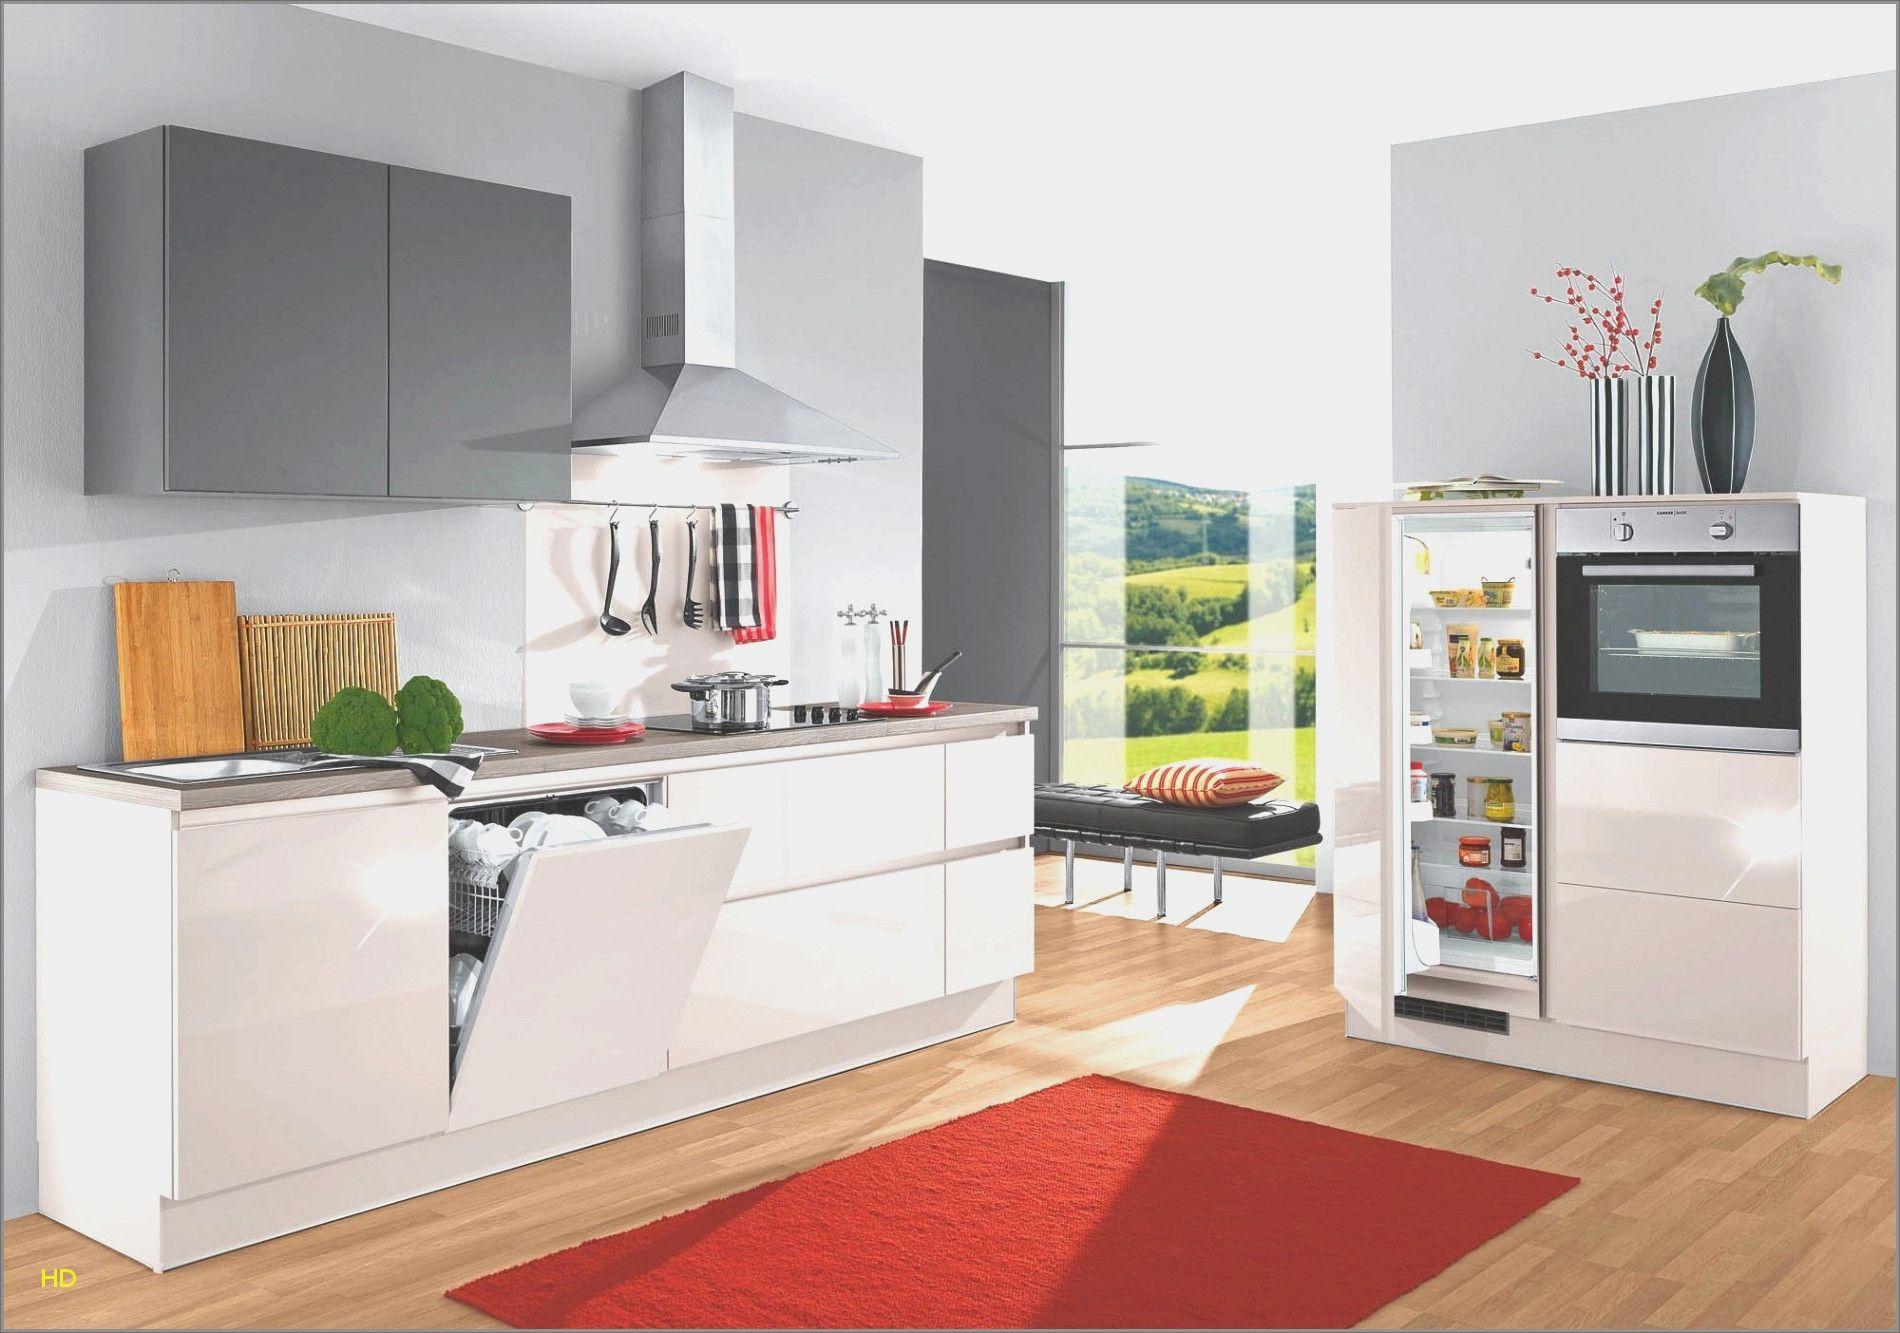 Lieferzeit Küche Ikea Inspirational Ikea Küche Lieferzeit